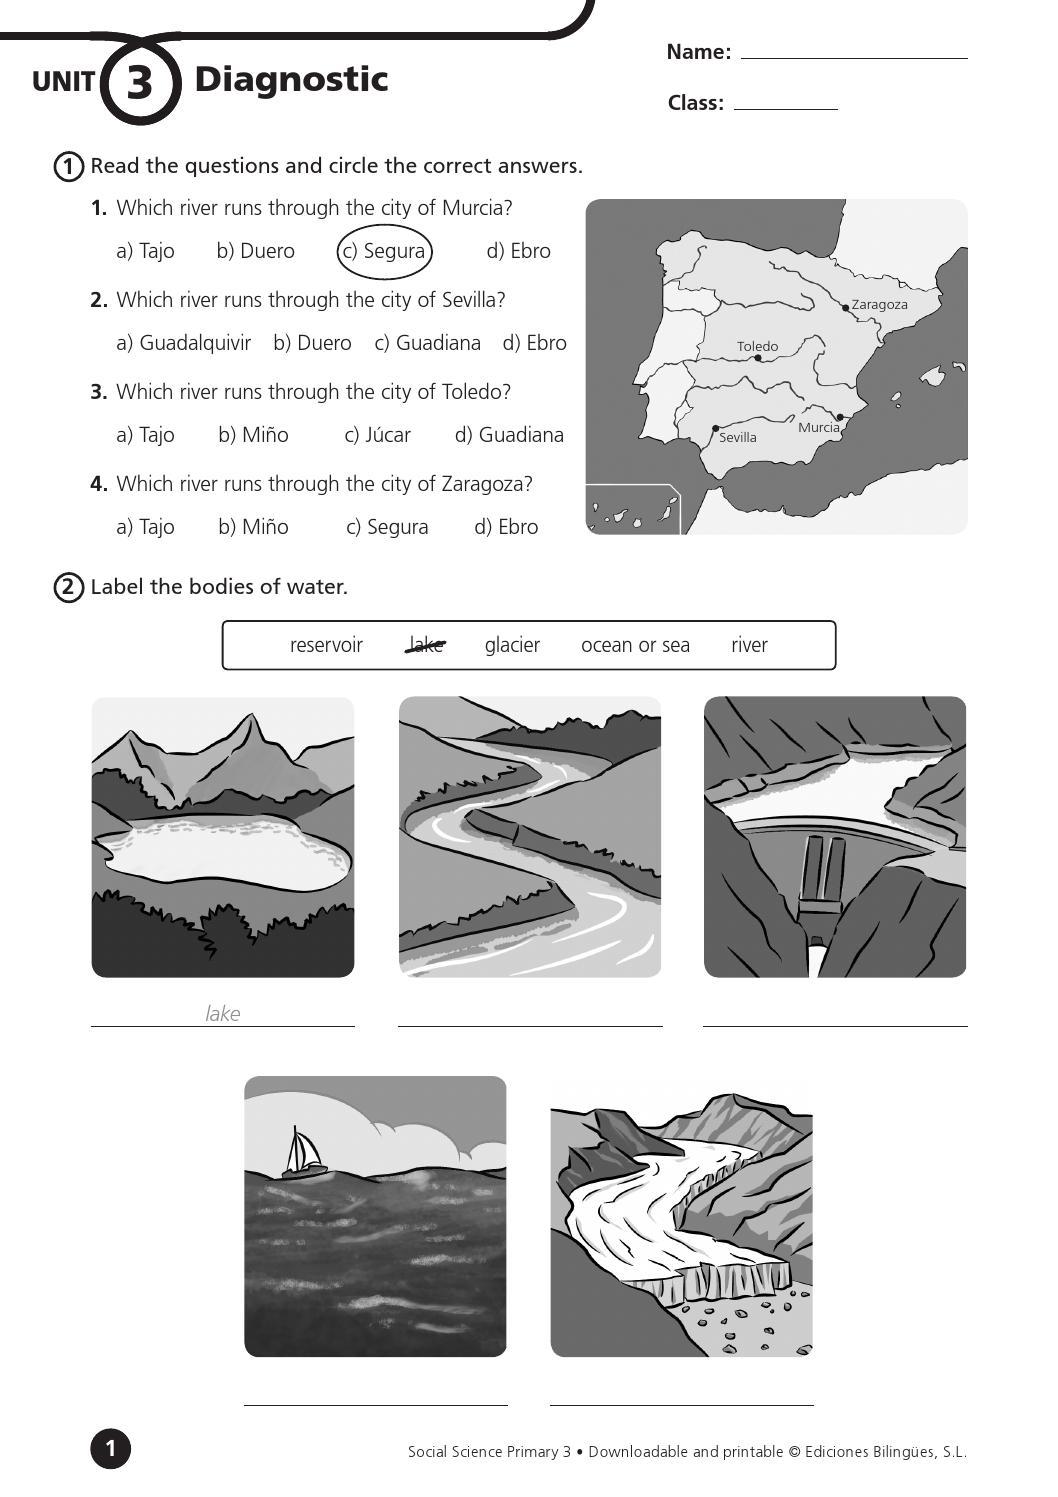 Water Cycle Worksheet additionally Original besides Water Cycle Evaporation Condensation Precipitation besides P Hdcj Vl Bsb Kjnrurb J K likewise S. on evaporation and condensation worksheets